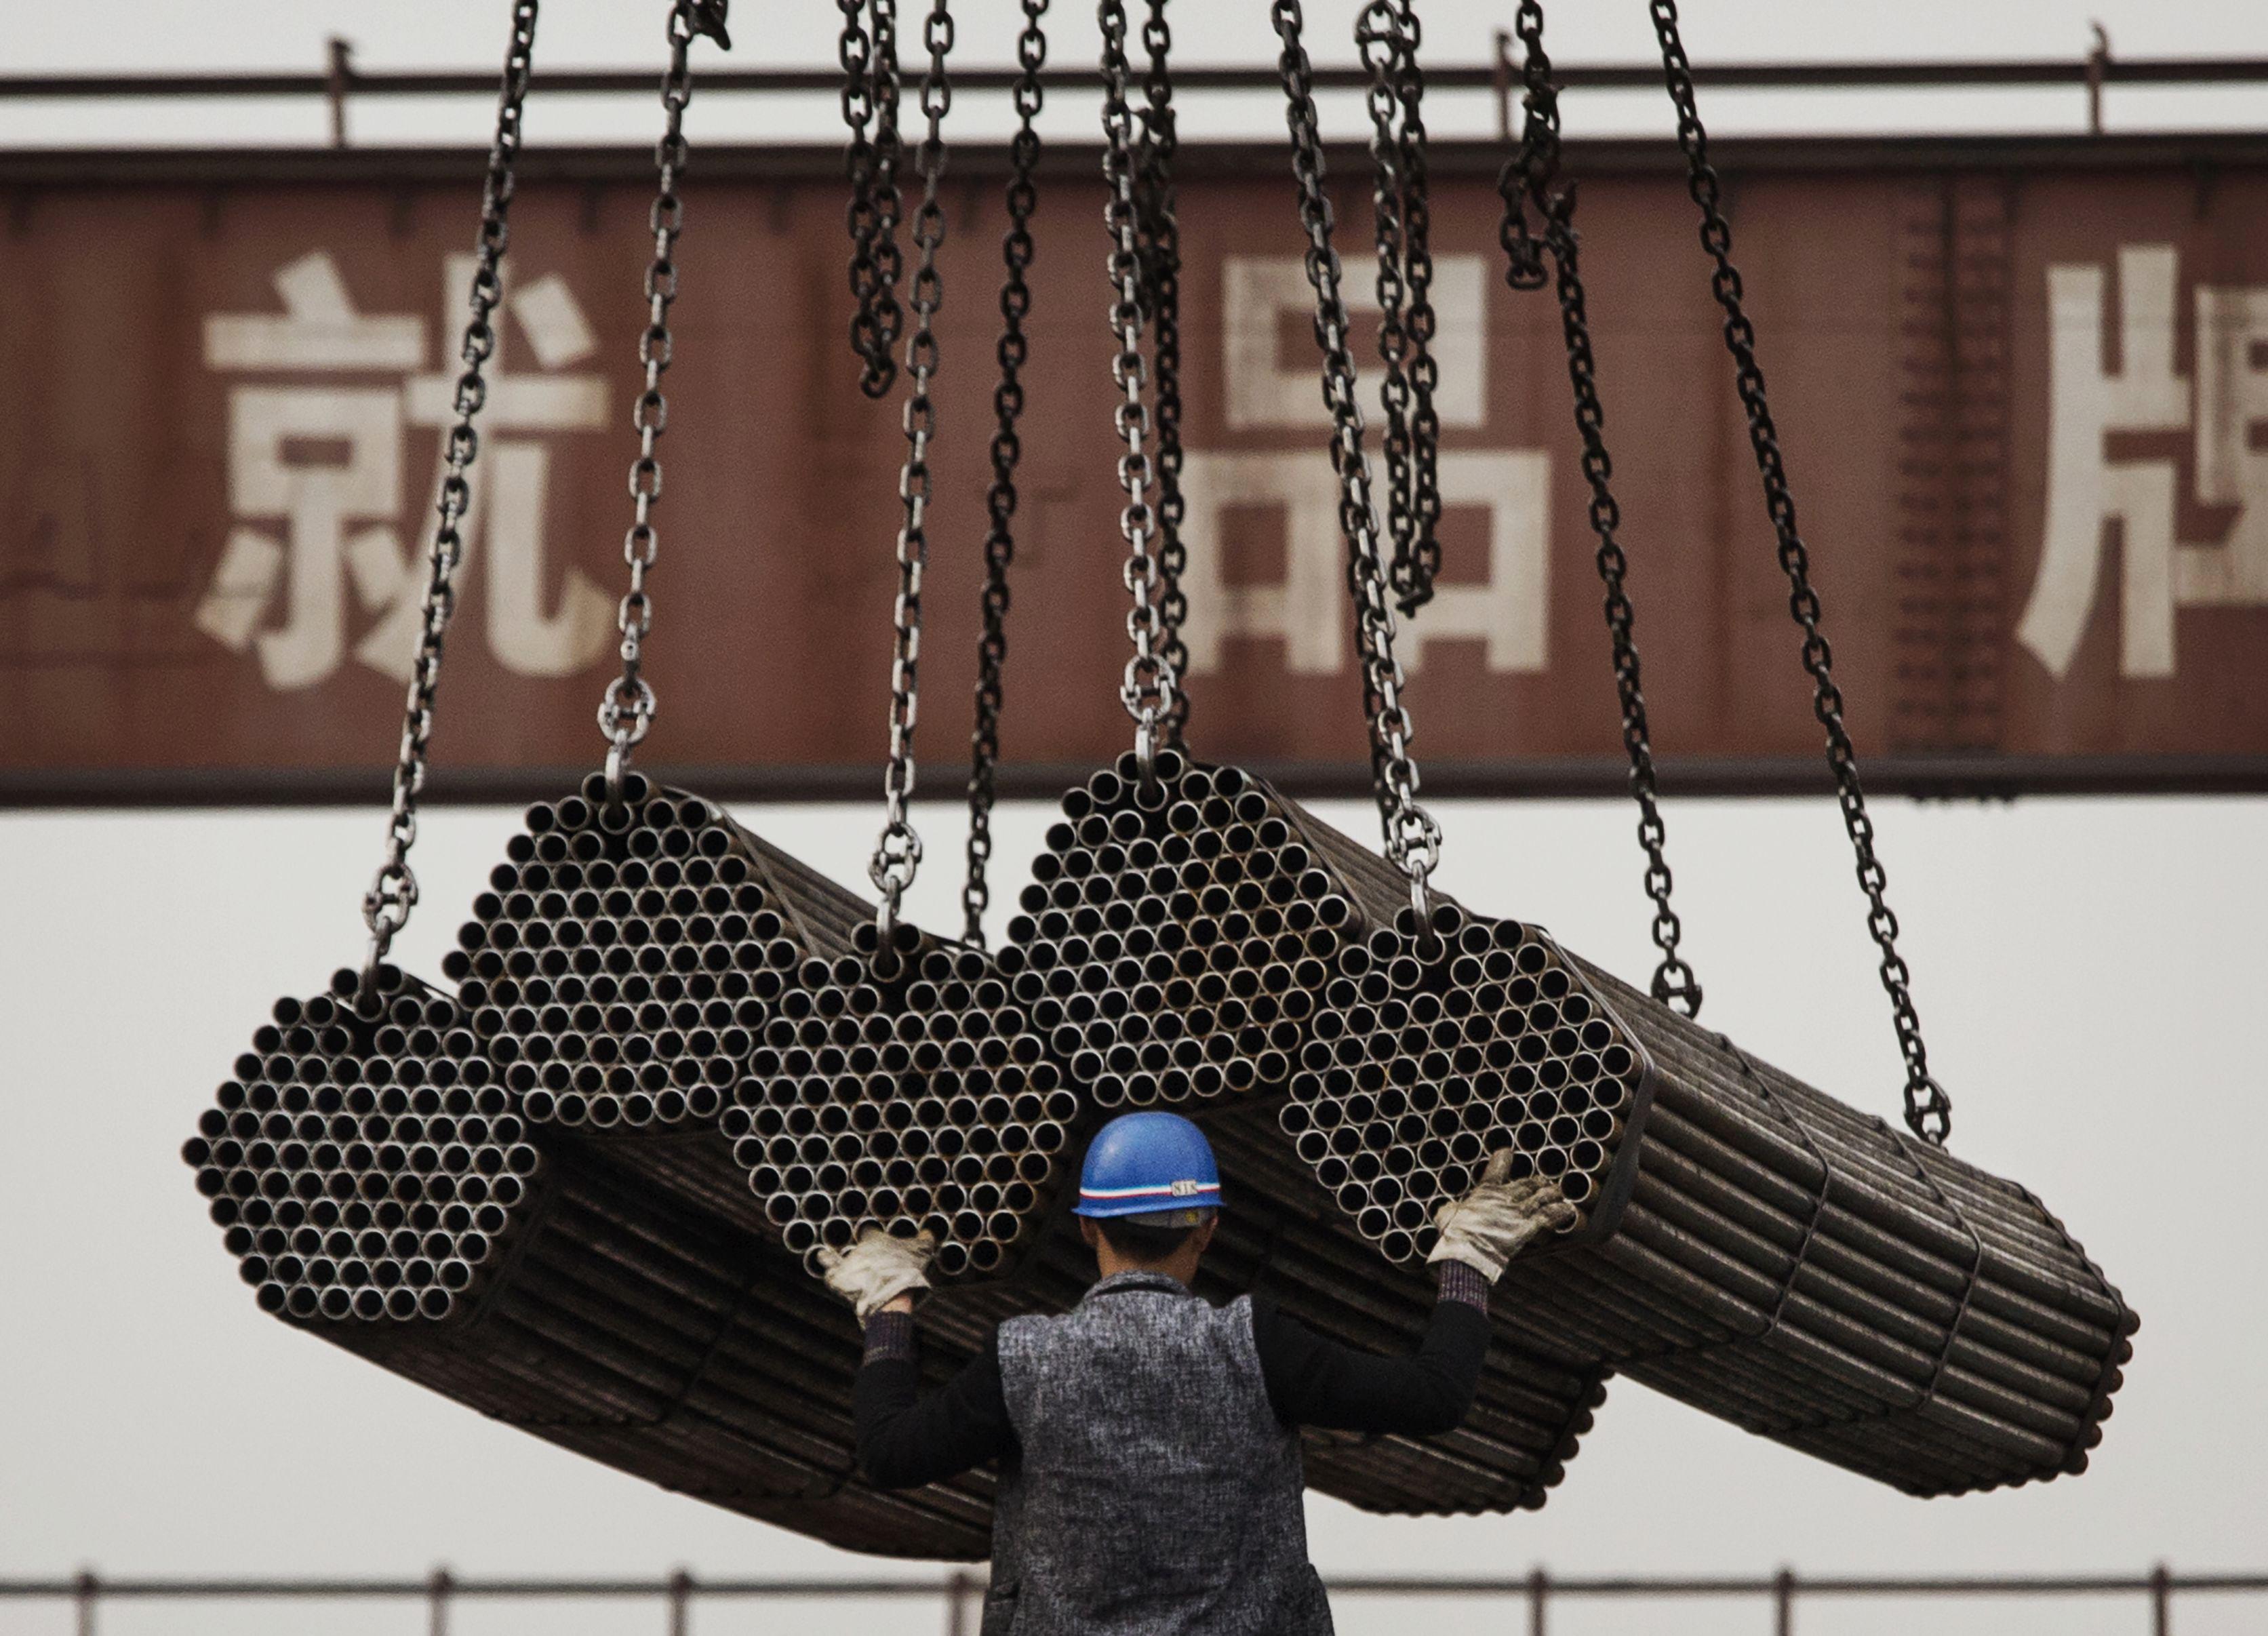 China Daily Life - Steel Economy